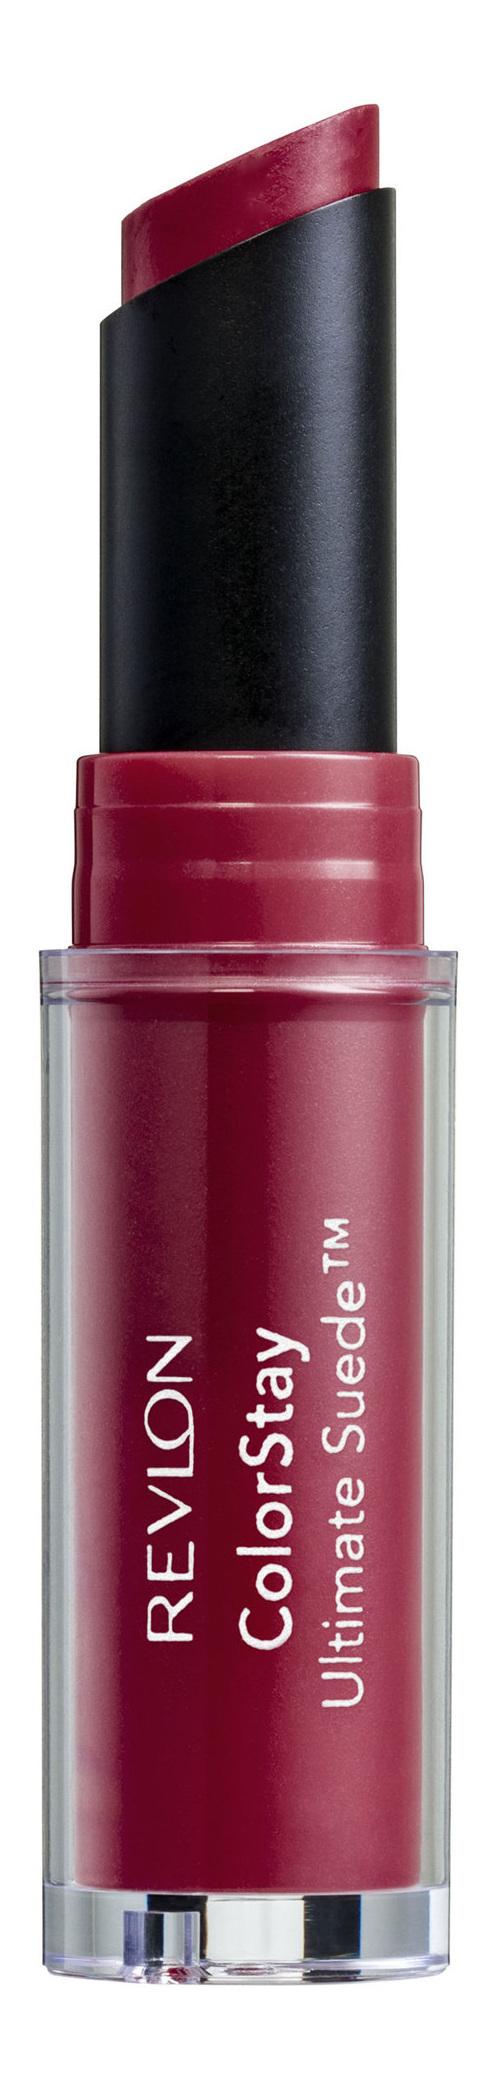 Revlon Colorstay Ultimate Suede™ Lipstick Ingenue